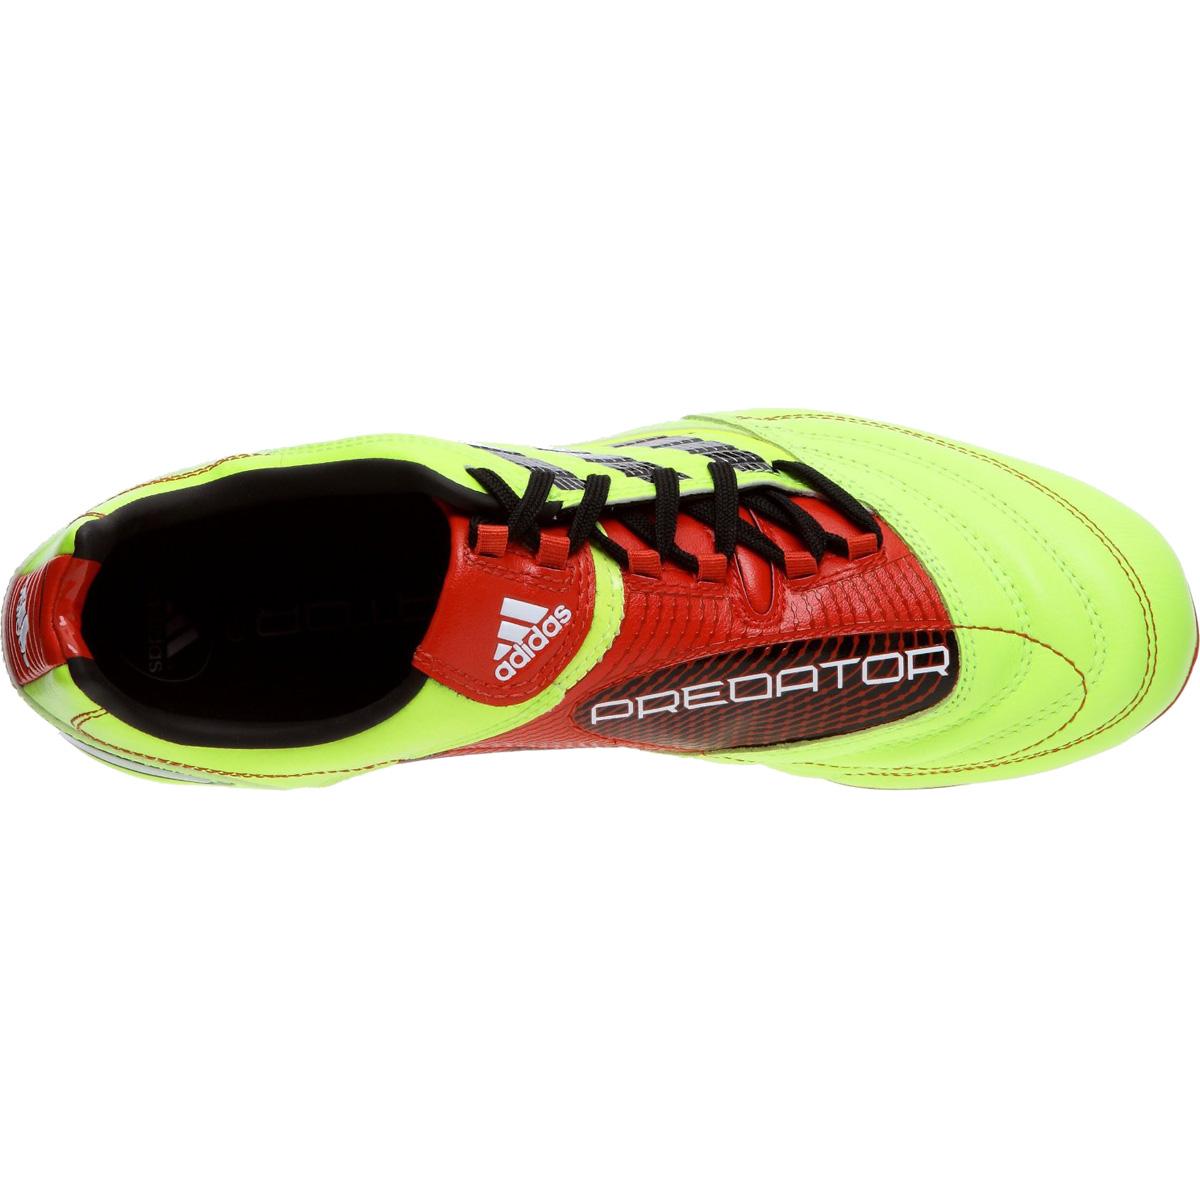 adidas-predator-absolion-x-trx-fg_3 The Predator